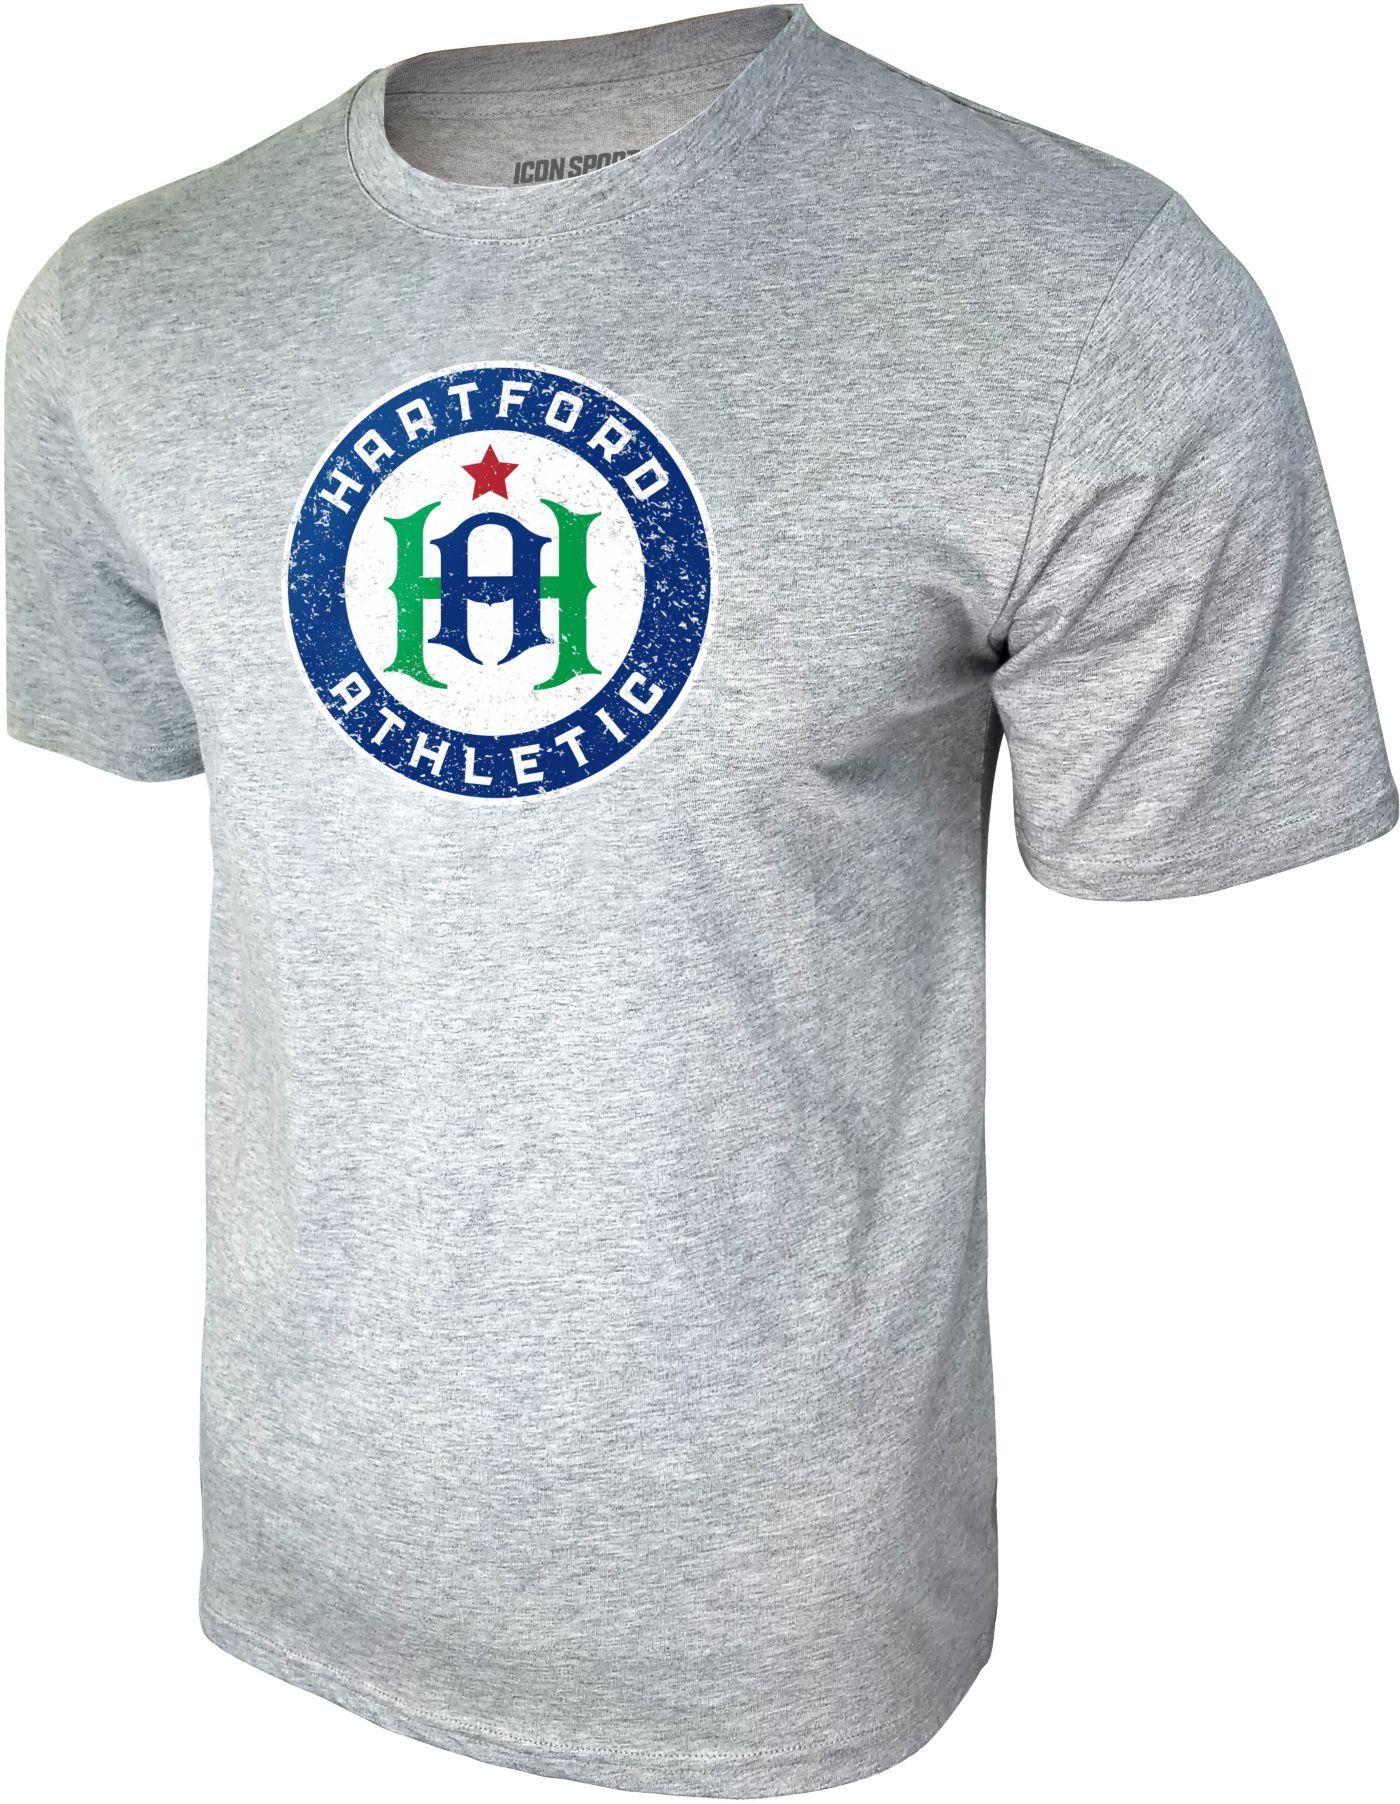 Icon Sports Group Men's Hartford Athletic Logo Heather Grey T-Shirt